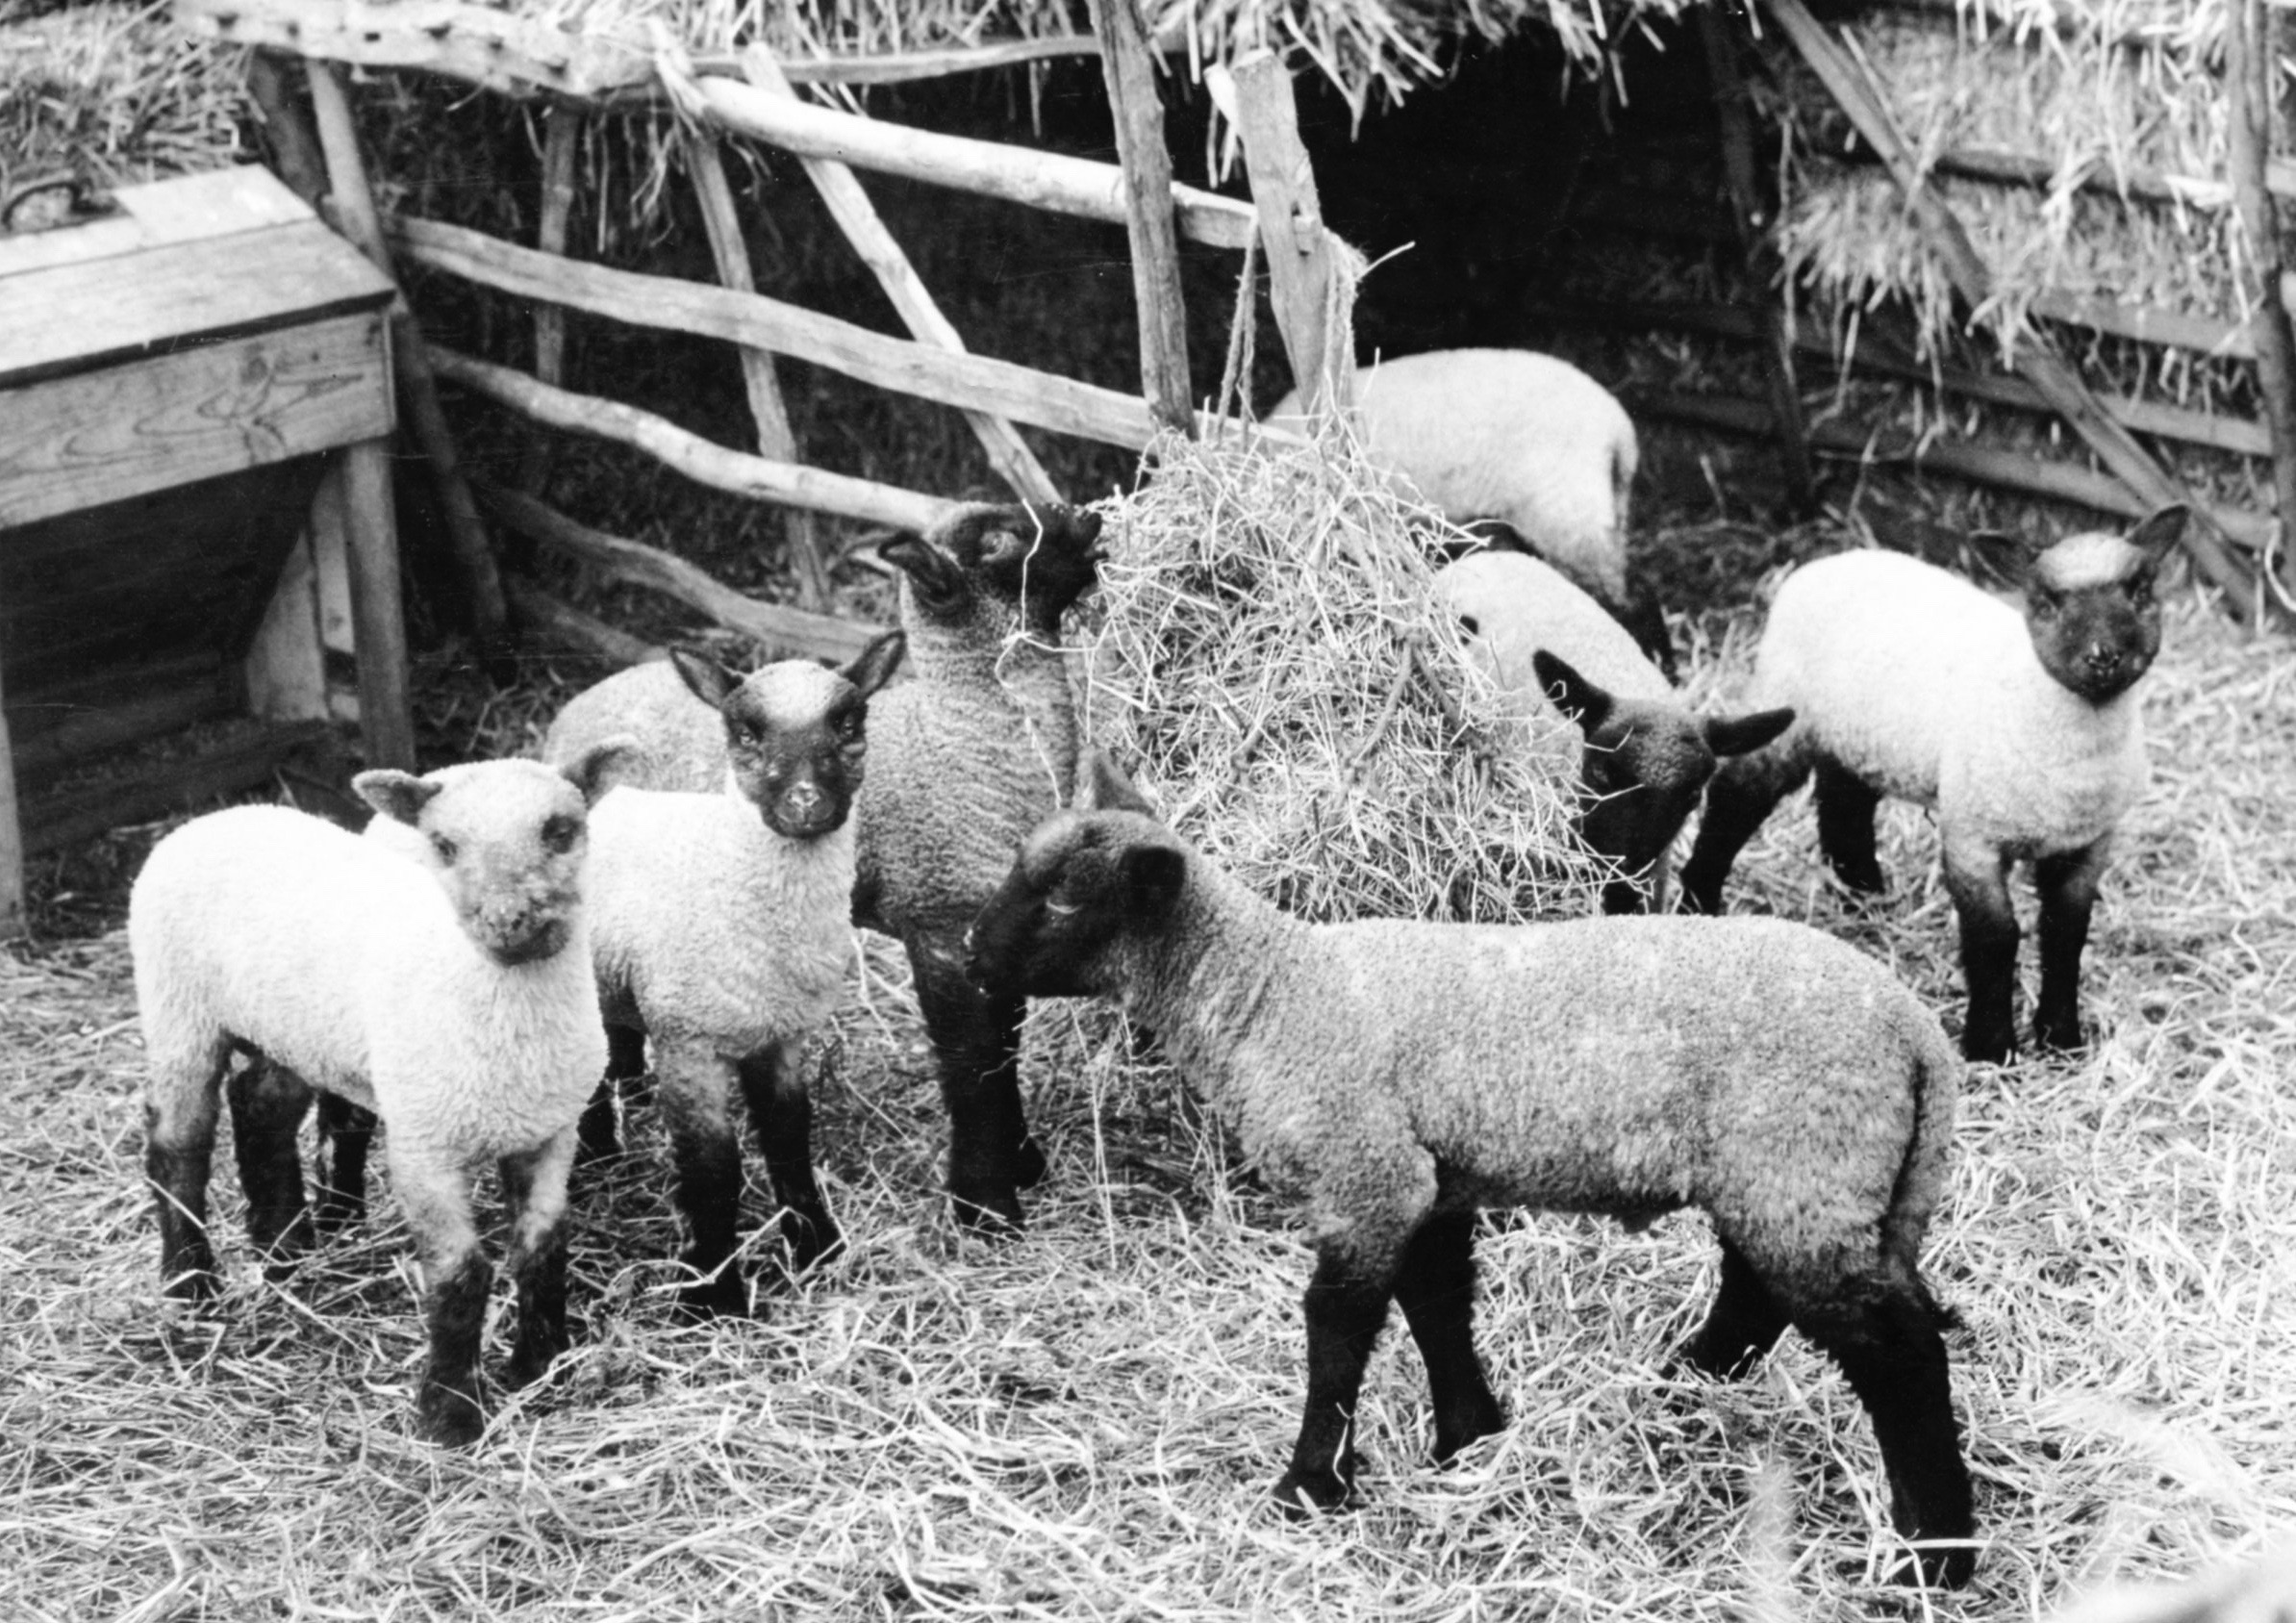 Suffolk lambs at Lackford in 1958